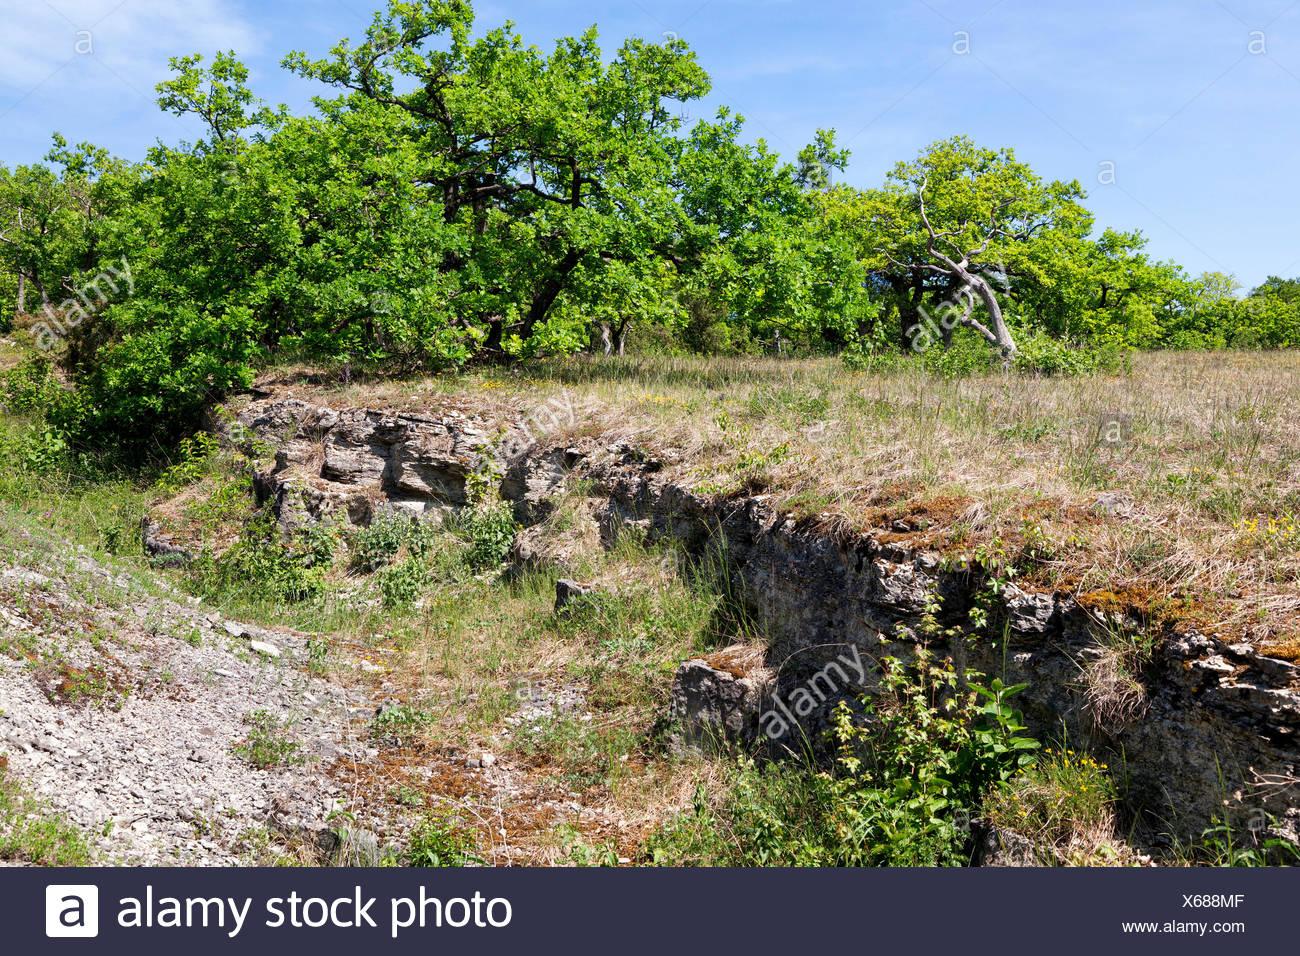 dry meadow and oak grove, arid environment, Germany, Bavaria, NSG Maeusberg - Stock Image